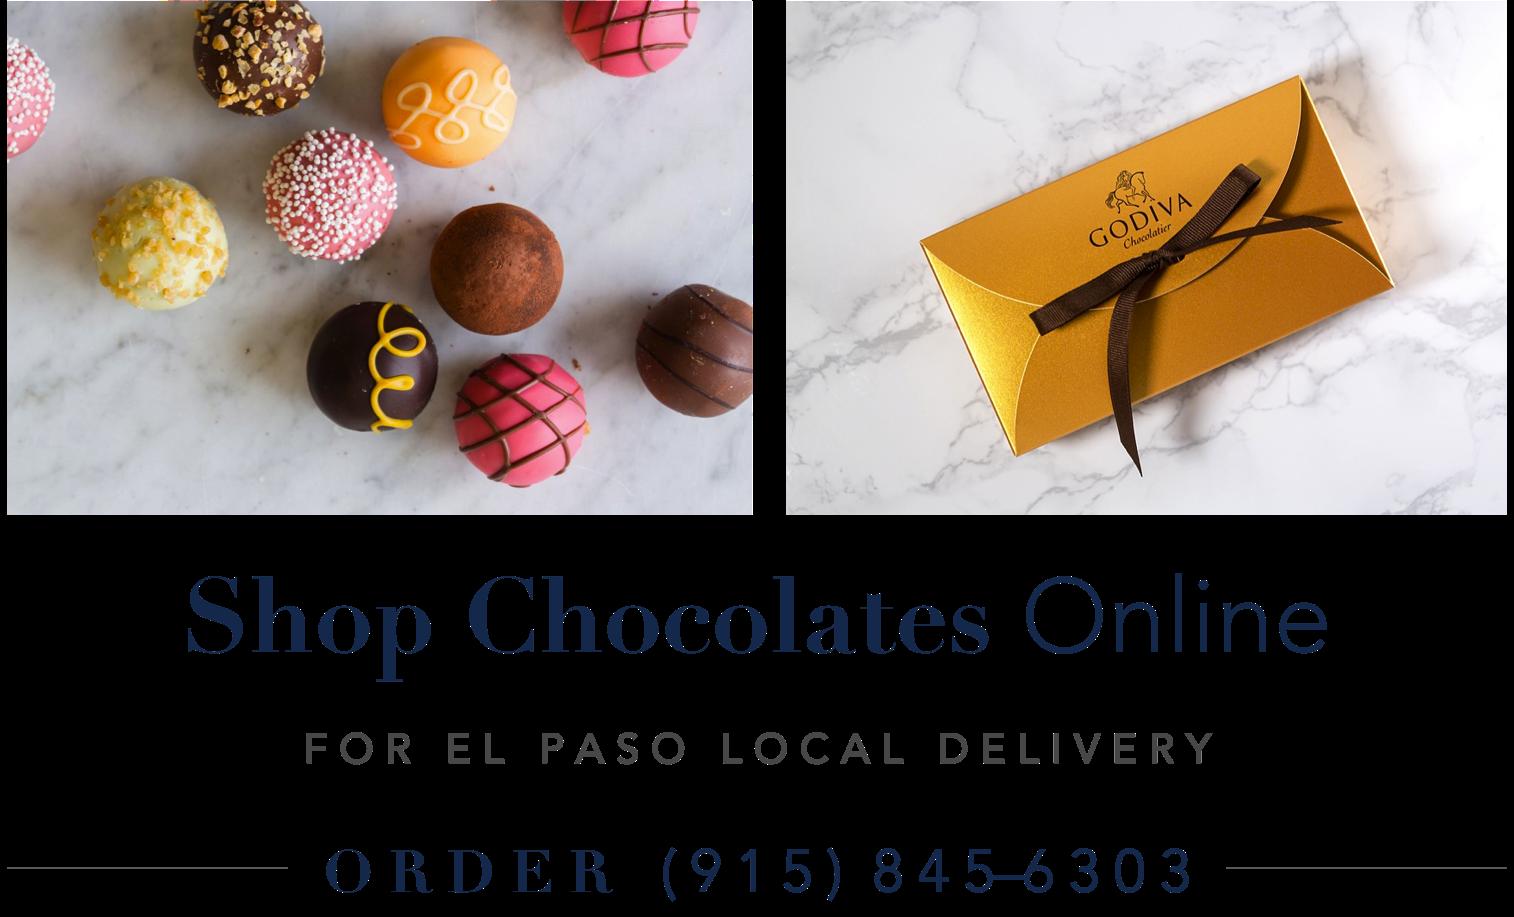 angies-floral-designs-el-paso-chocolat-chocolates-el-paso-chocolates-flowershop-chocolates-gift-baskets-candy-el-paso-times-el-paso-flowershop-el-paso-florist-79912-angies-flower-flowershop-el-paso-west.png